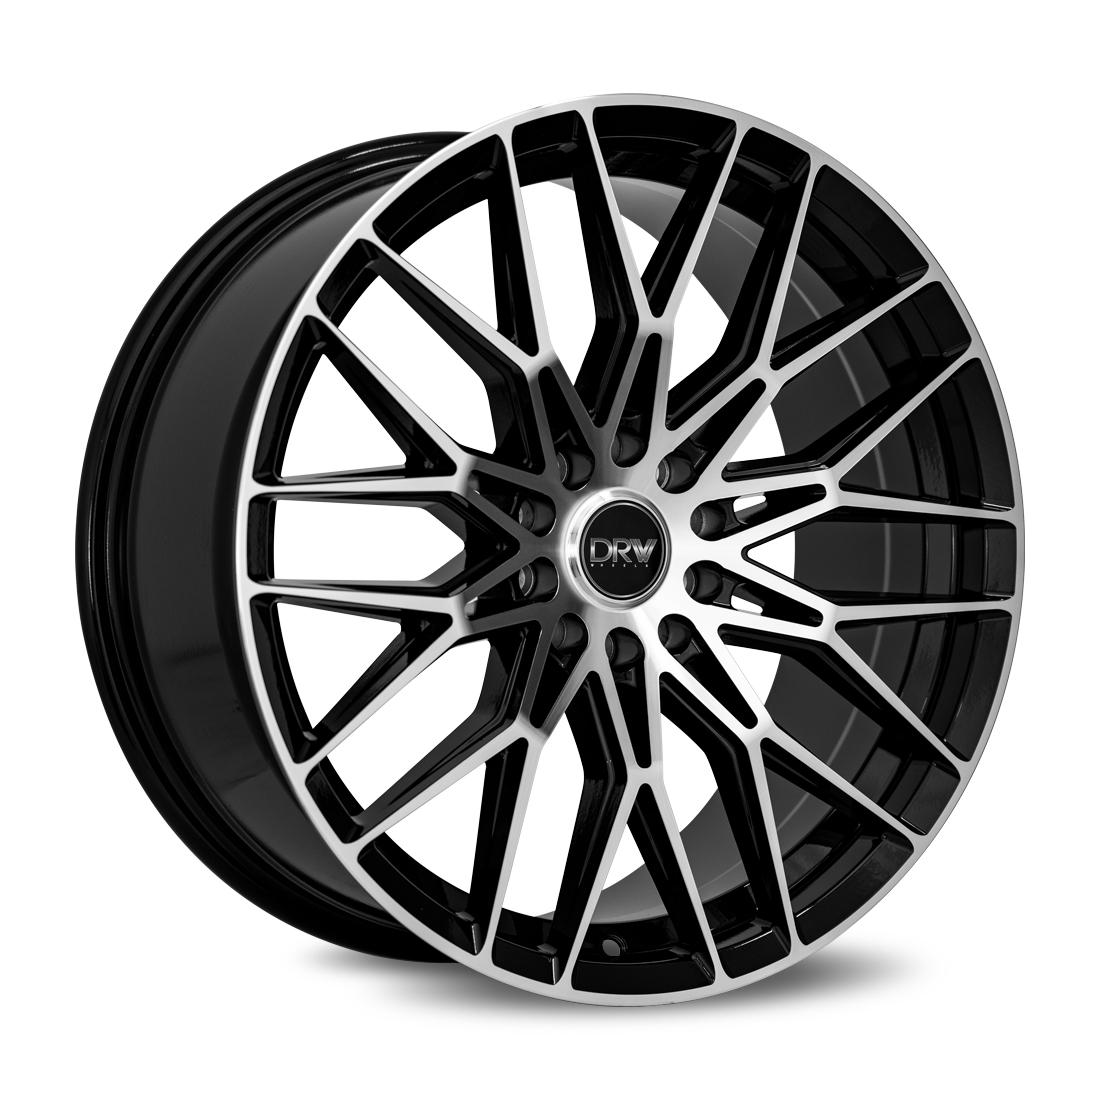 Diablo Racing Wheels DRW D21 - Gloss Black Machined Face Rim